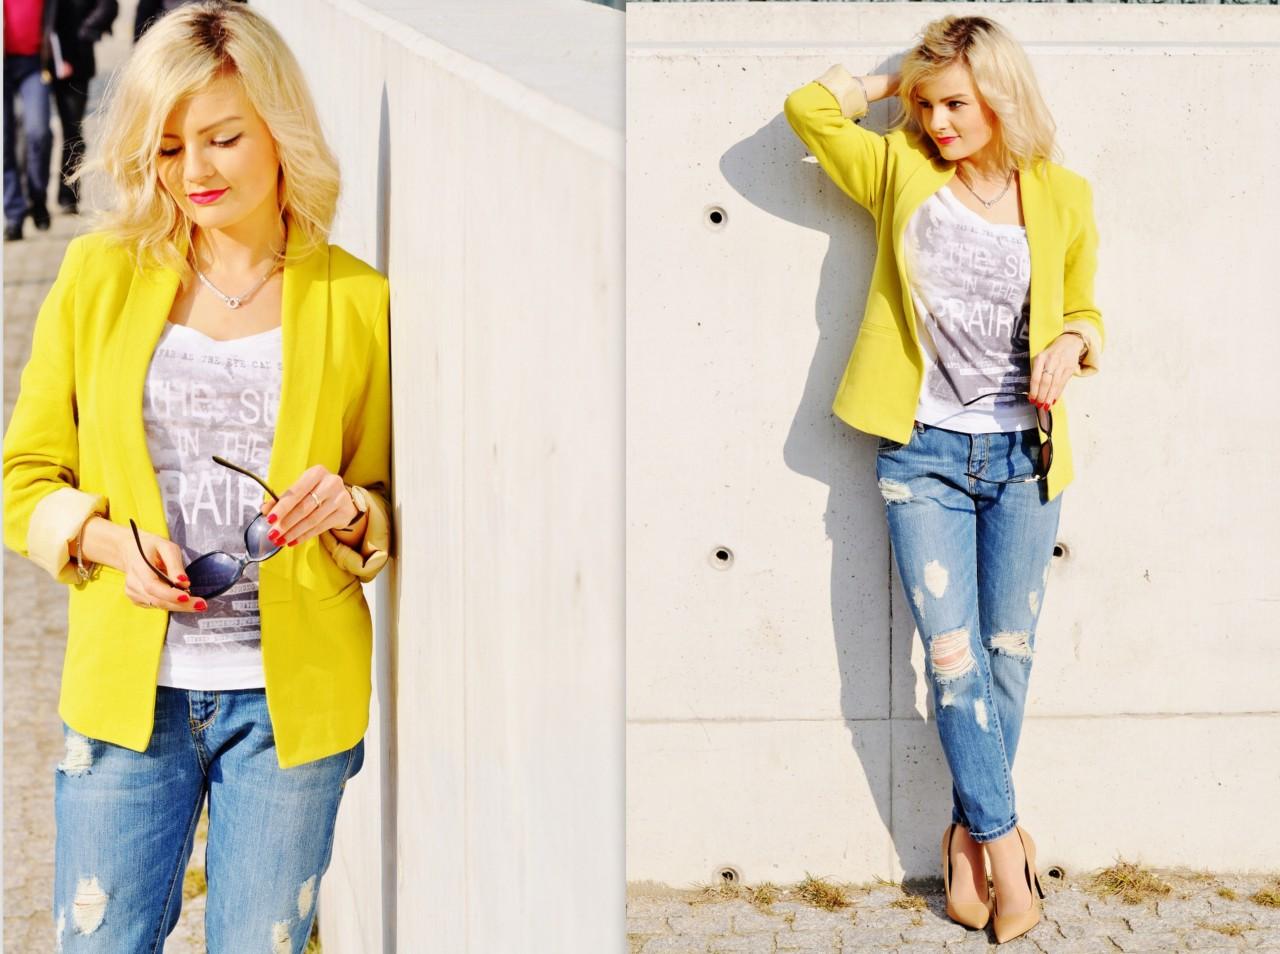 c6a1d6f74ae2e Moja stylizacja - jak nosić marynarkę - Fashionable - Blog ...